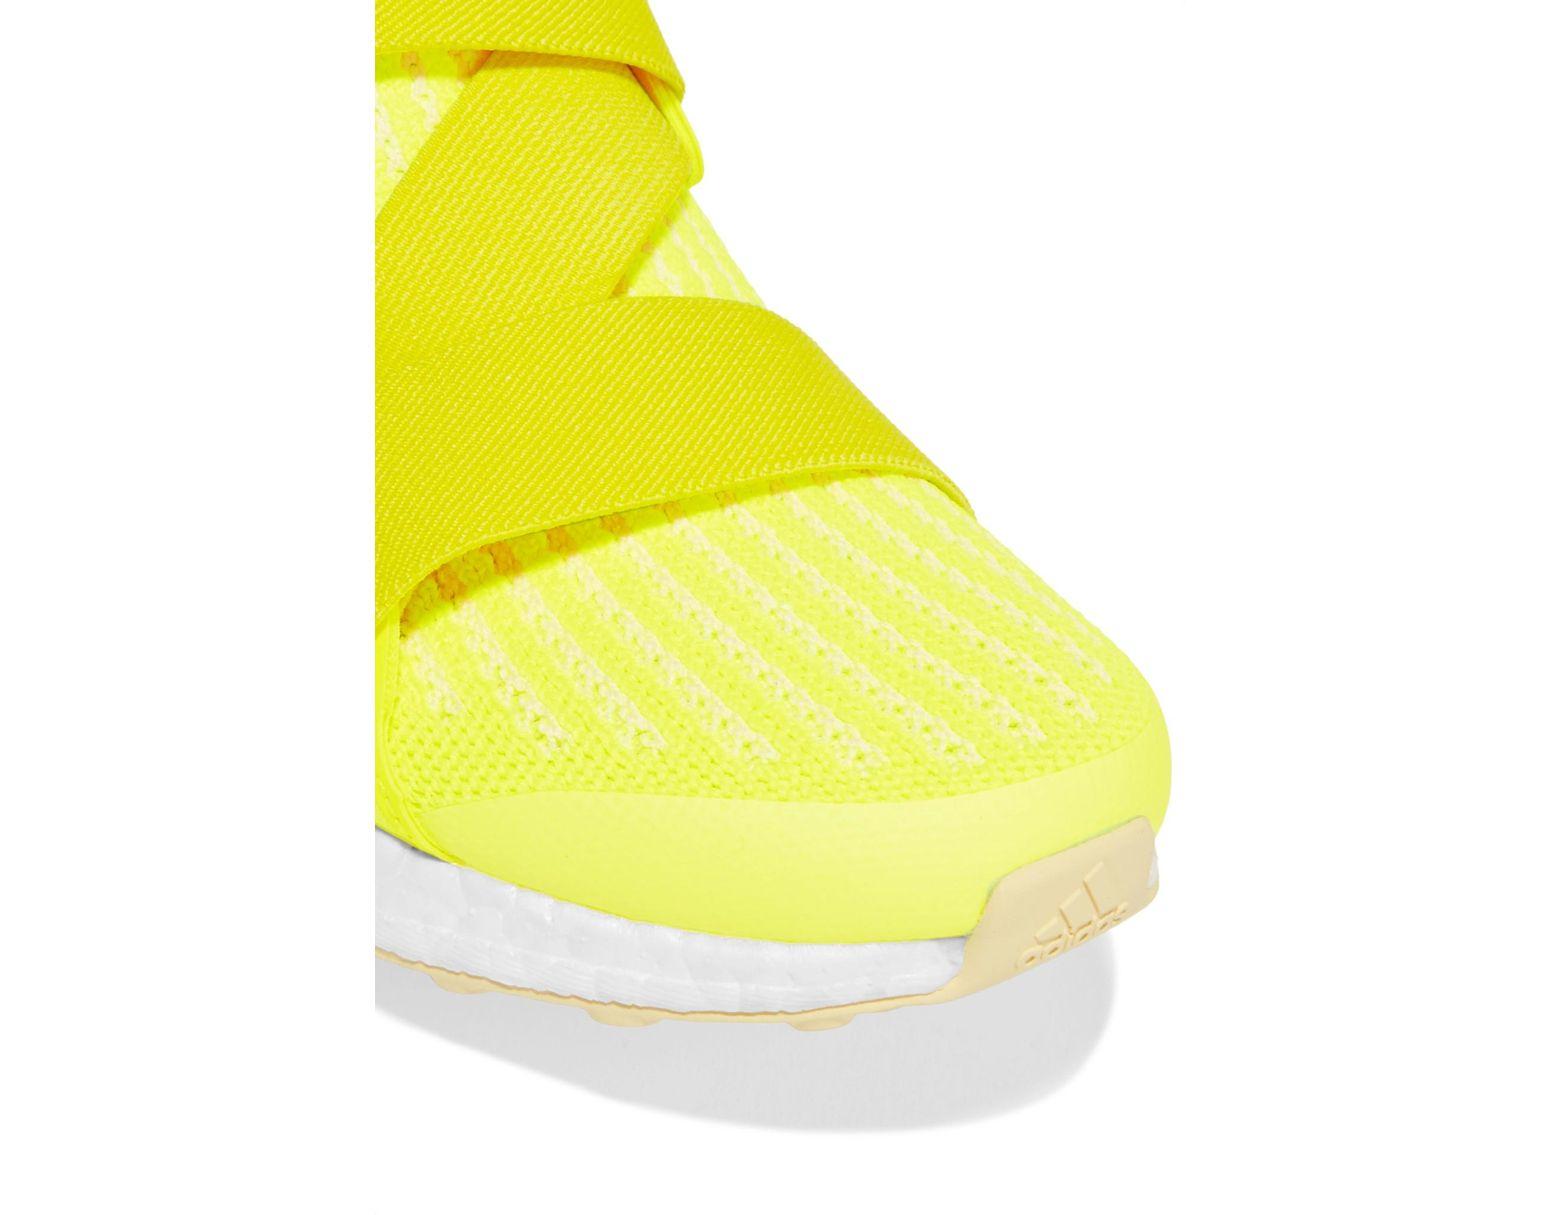 huge selection of 89ac8 3570a Lyst - adidas By Stella McCartney Ultraboost X Neon Primeknit Sneakers in  Yellow